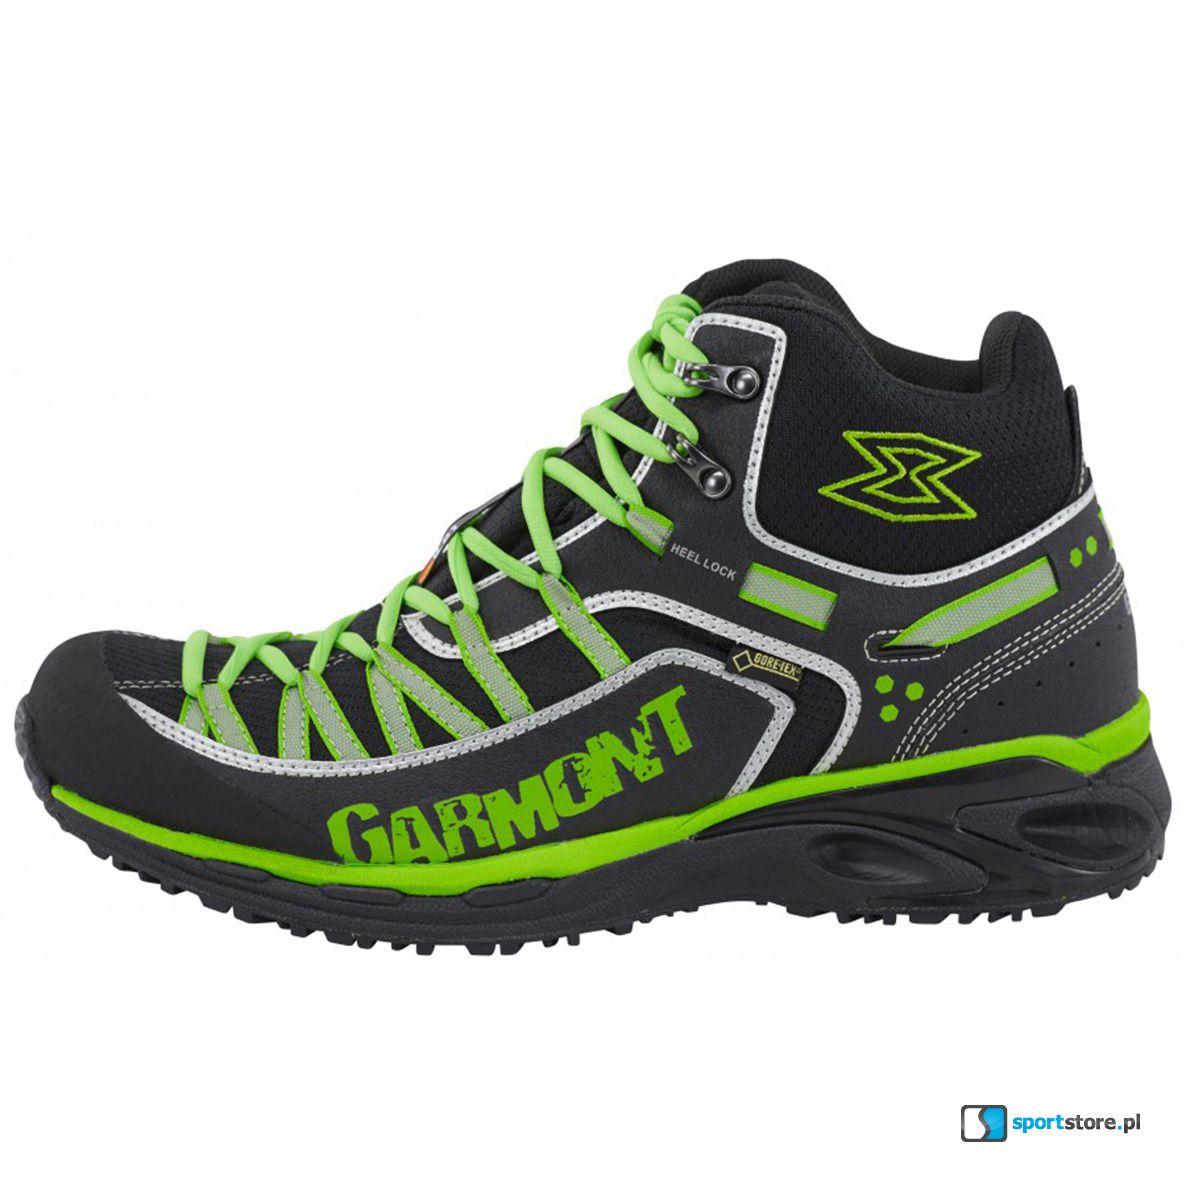 Buty Trekkingowe Garmont 9 81 Escape Pro Mid Gtx Black Green Gore Tex Hoka Running Shoes Gore Tex Black